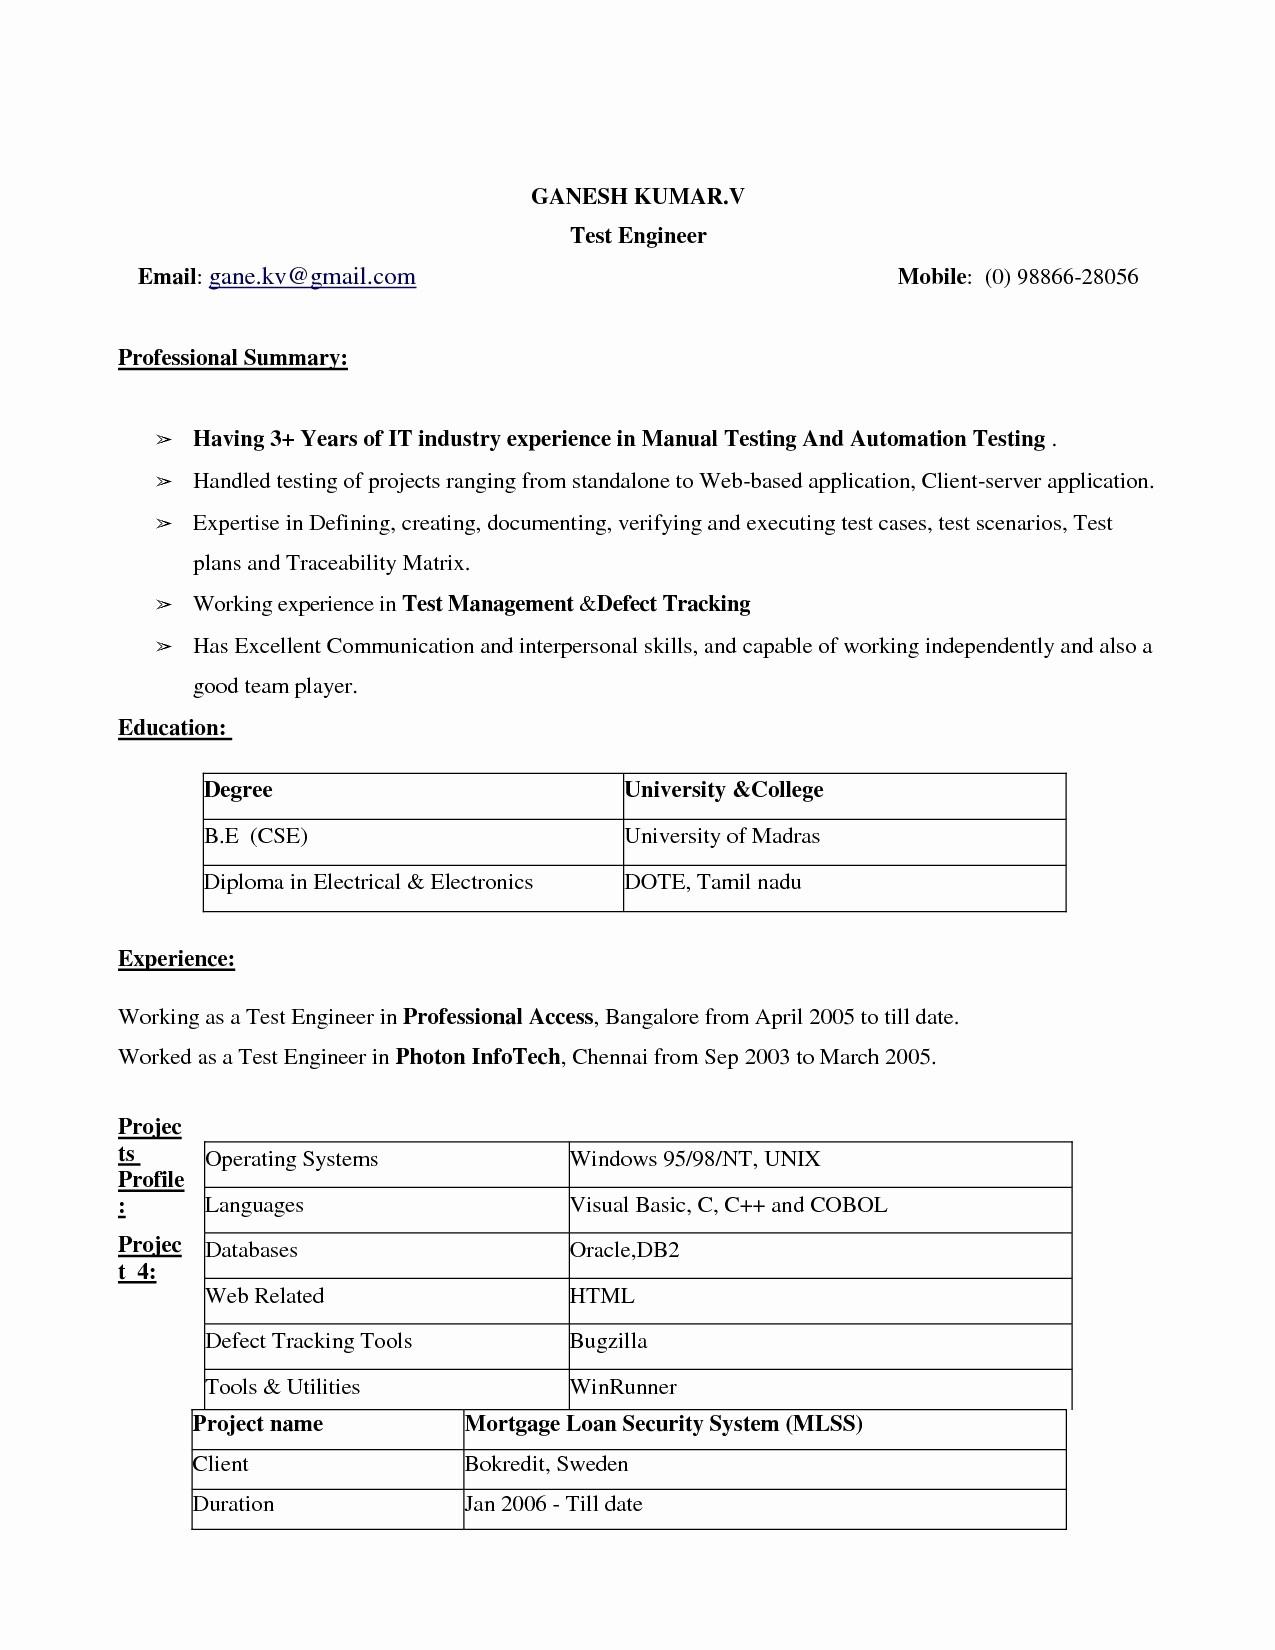 Resume Templates Download Microsoft Word Best Of Resume Template Microsoft Word 2017